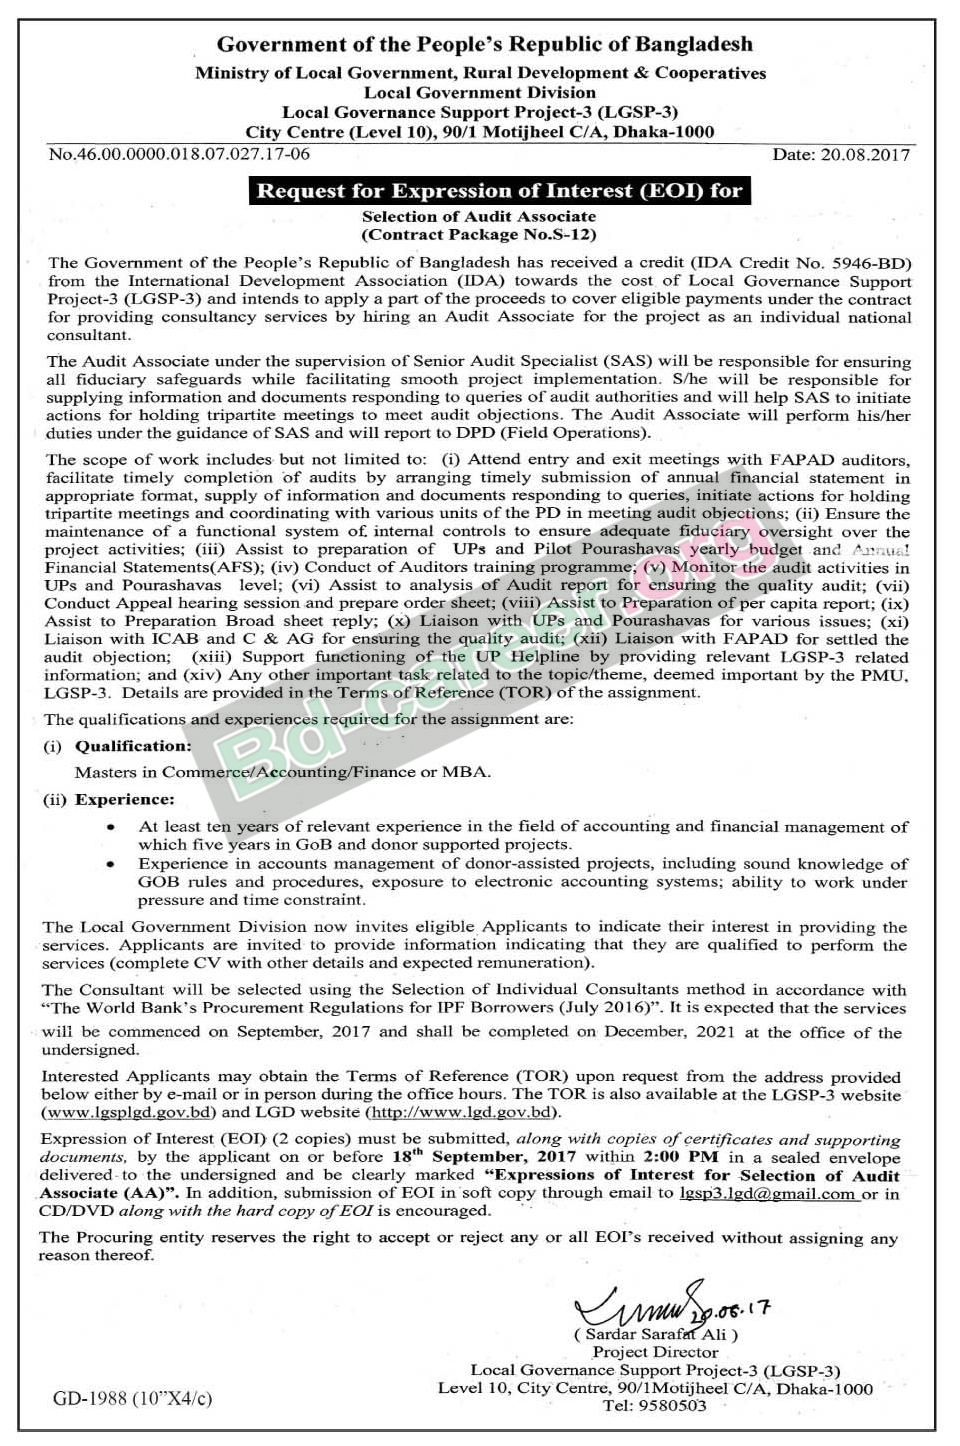 Lgd Job Circular Published New Job Vacancy Notice At WwwLgdGov